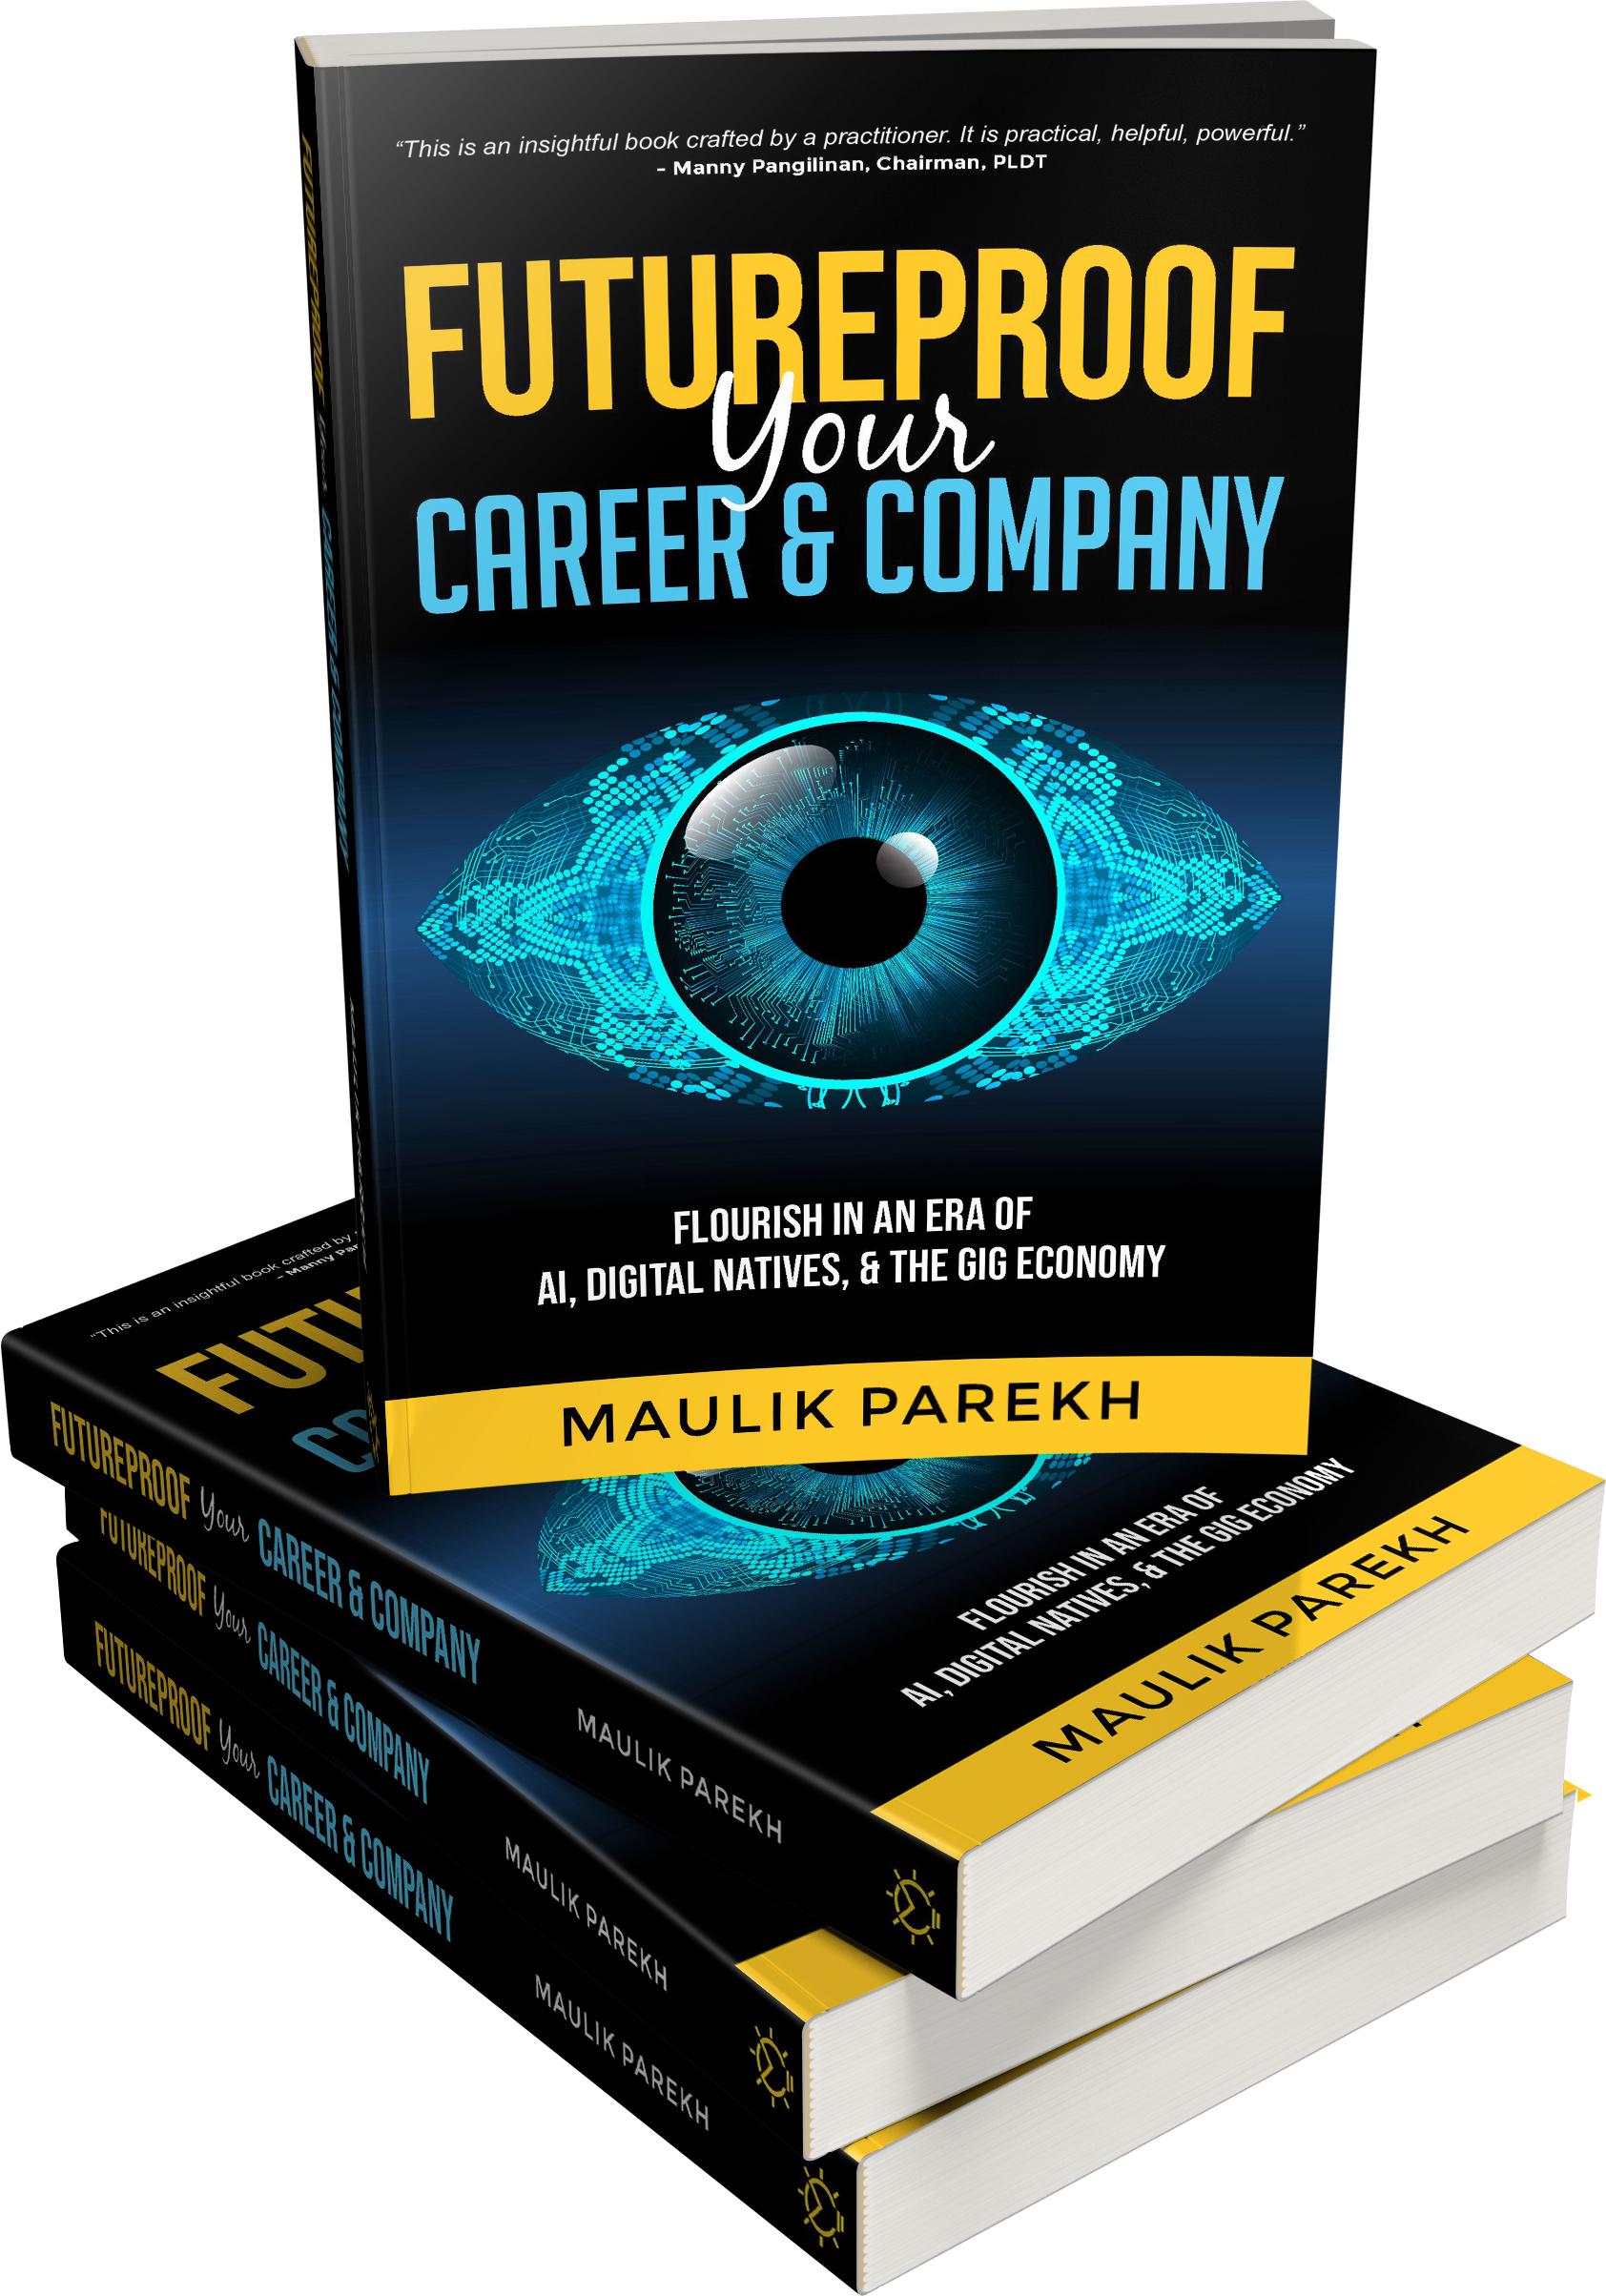 "Award-winning CEO Maulik Parekh makes writing debut, ""Future Proof Your Company and Career"""